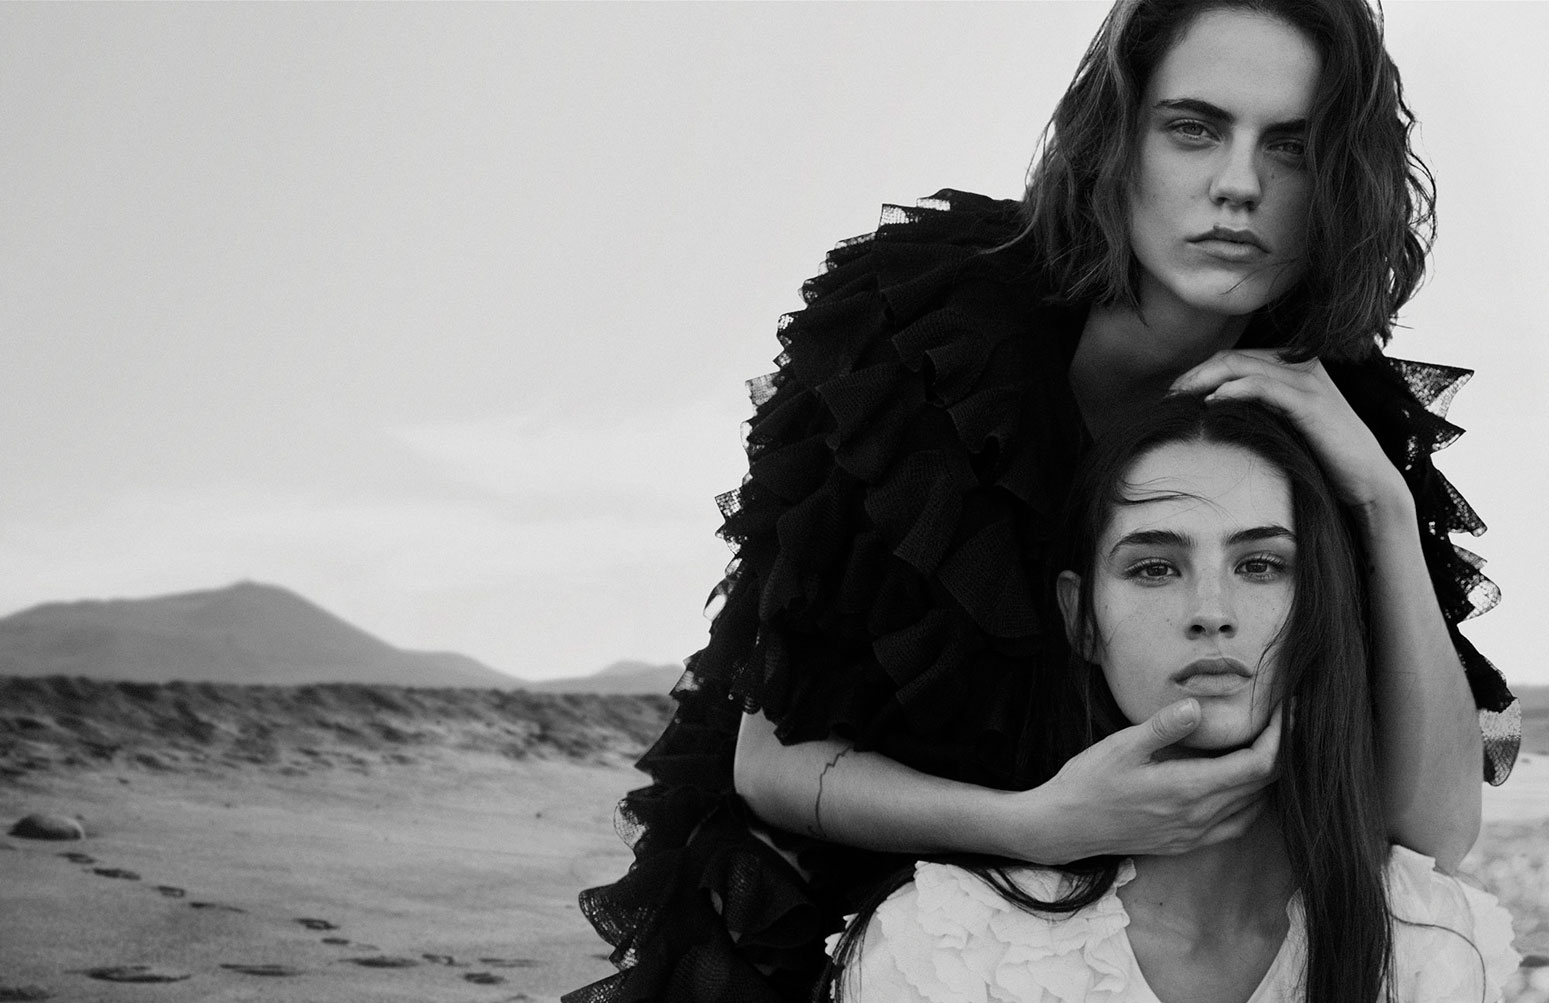 Vogue_EspañaVacia_F03_735_B